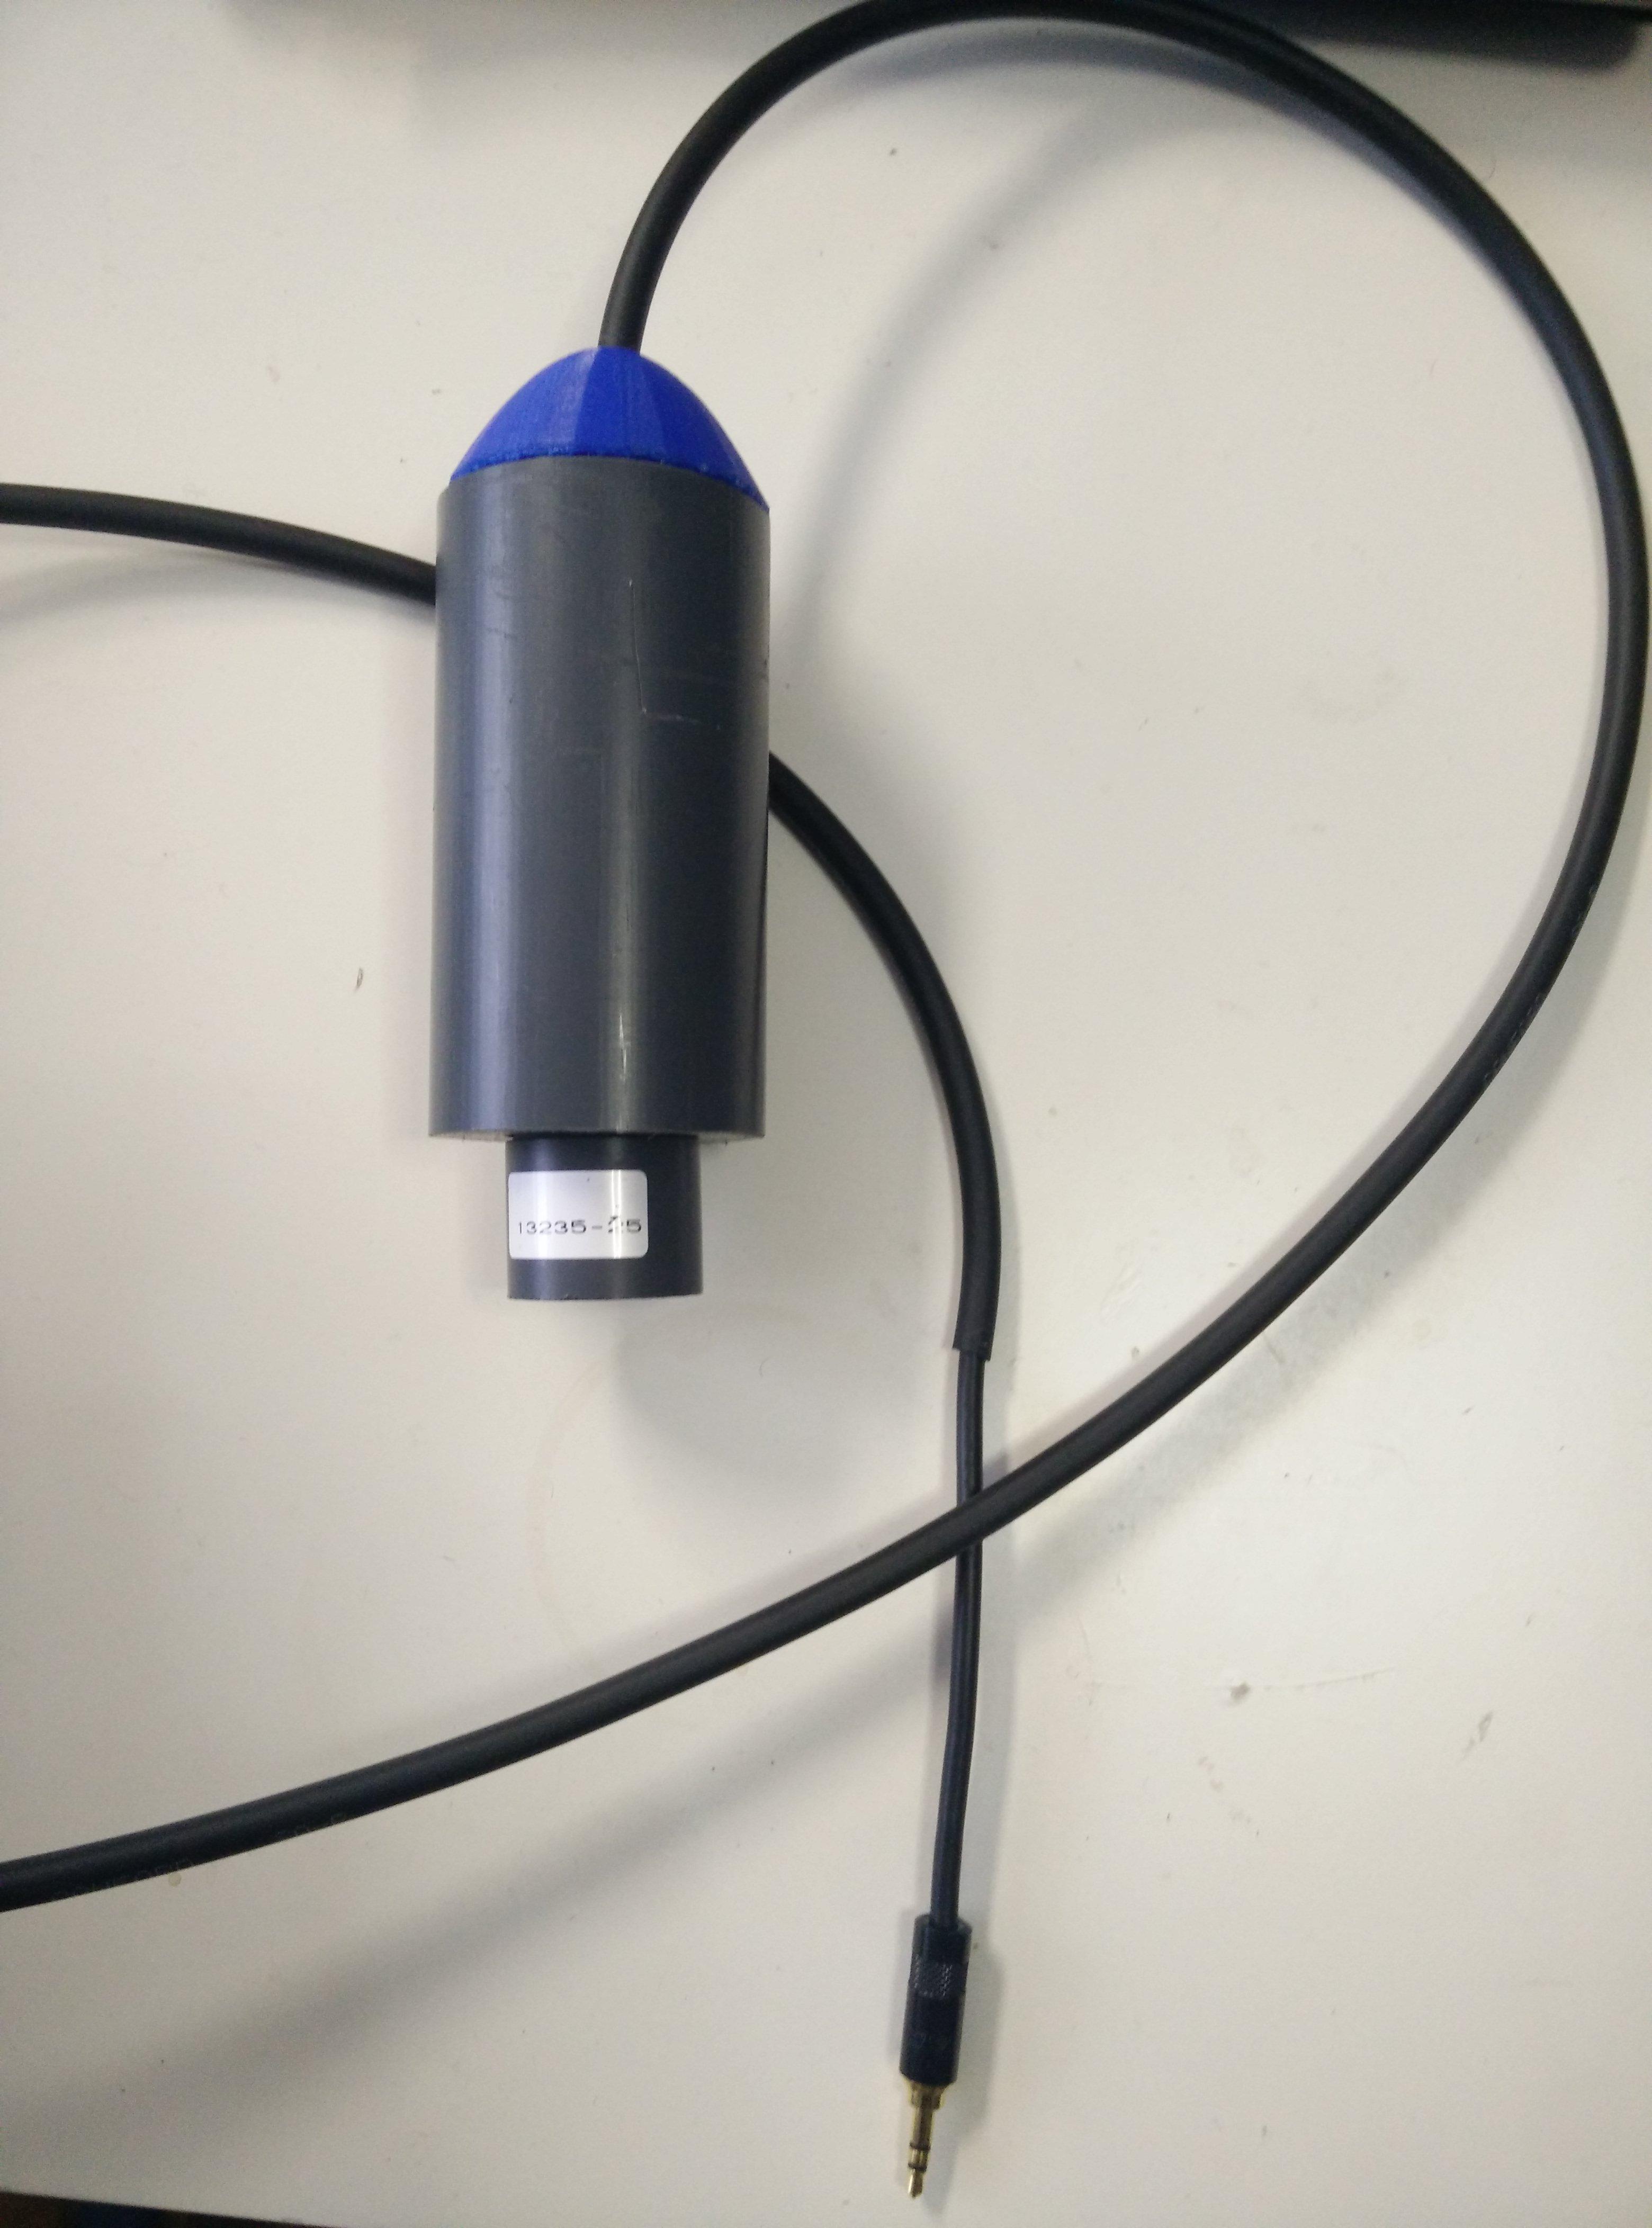 Sensor Tech SQ26-05 CUST